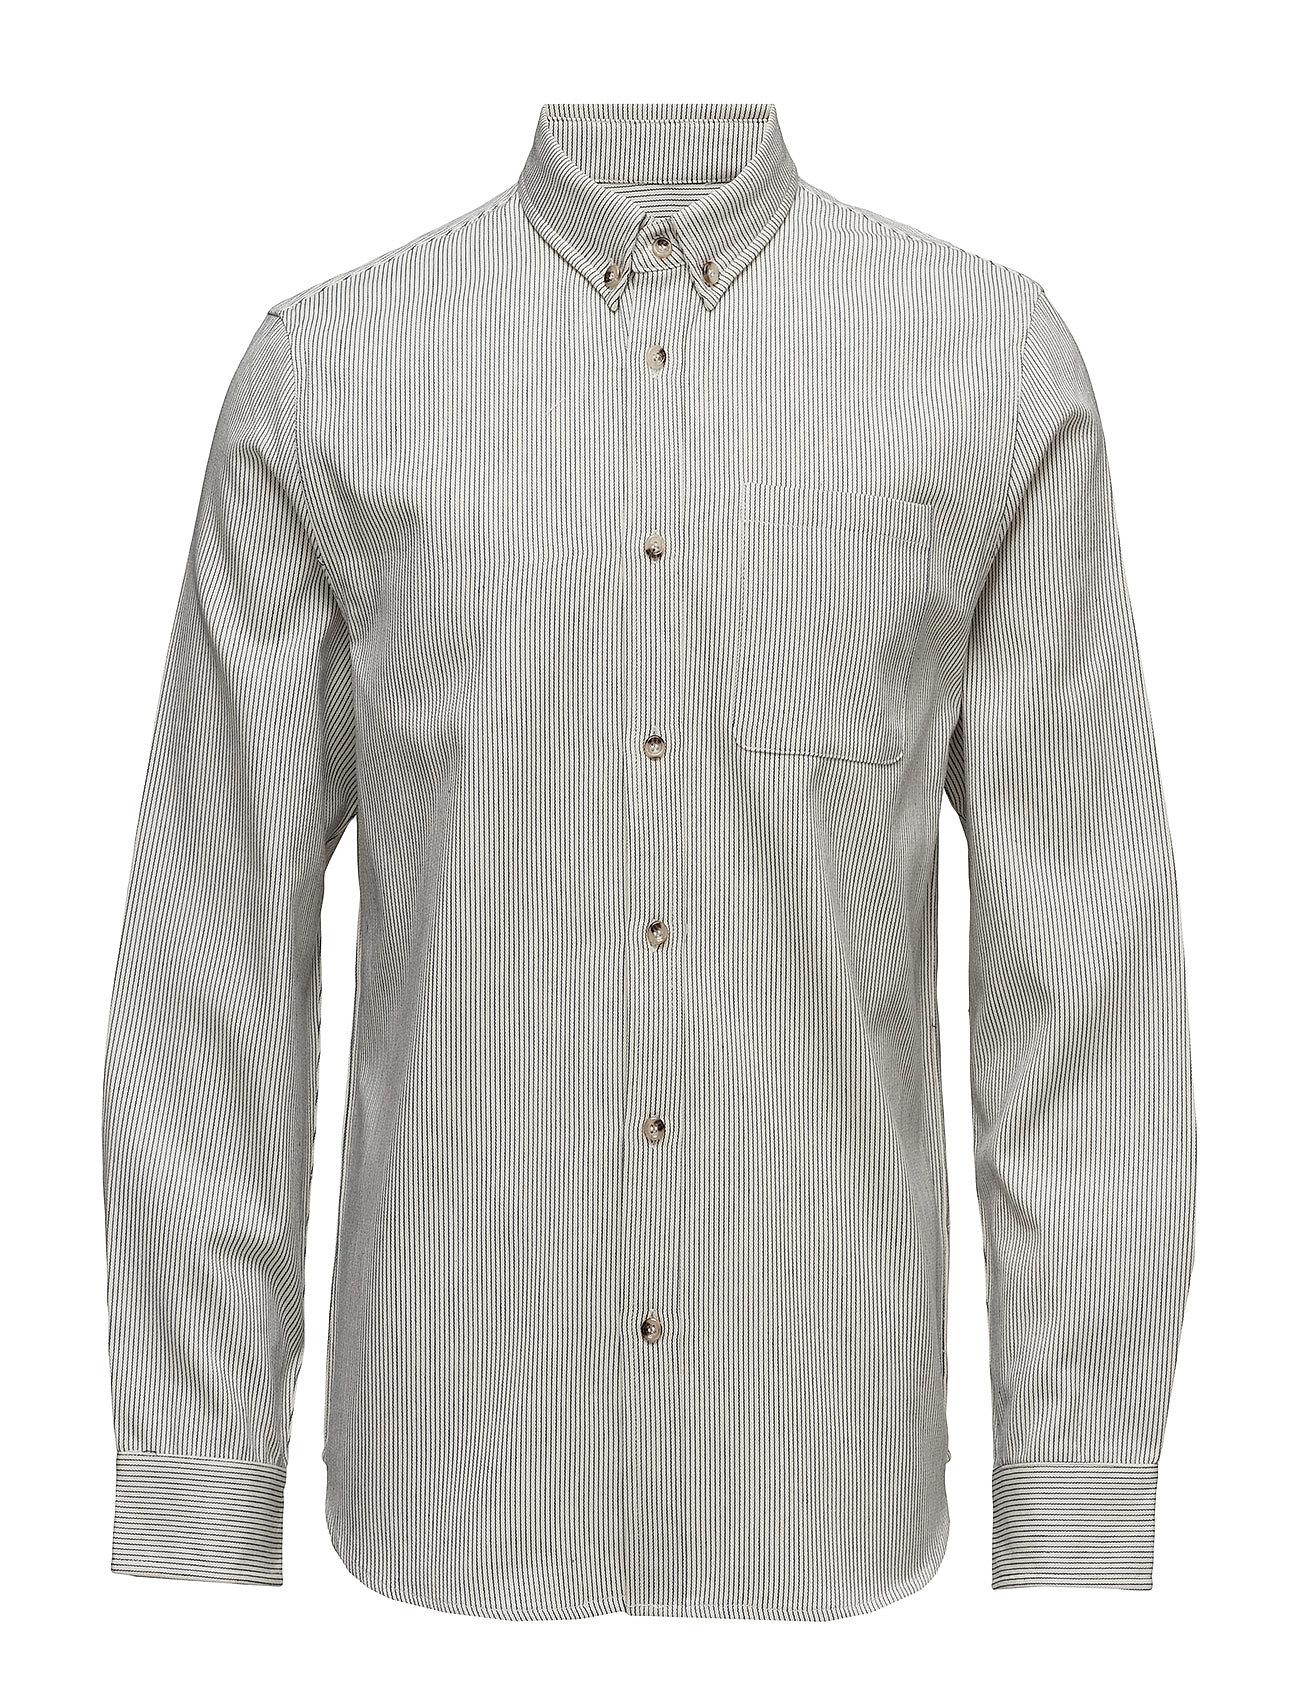 native north – Herringbone shirt på boozt.com dk